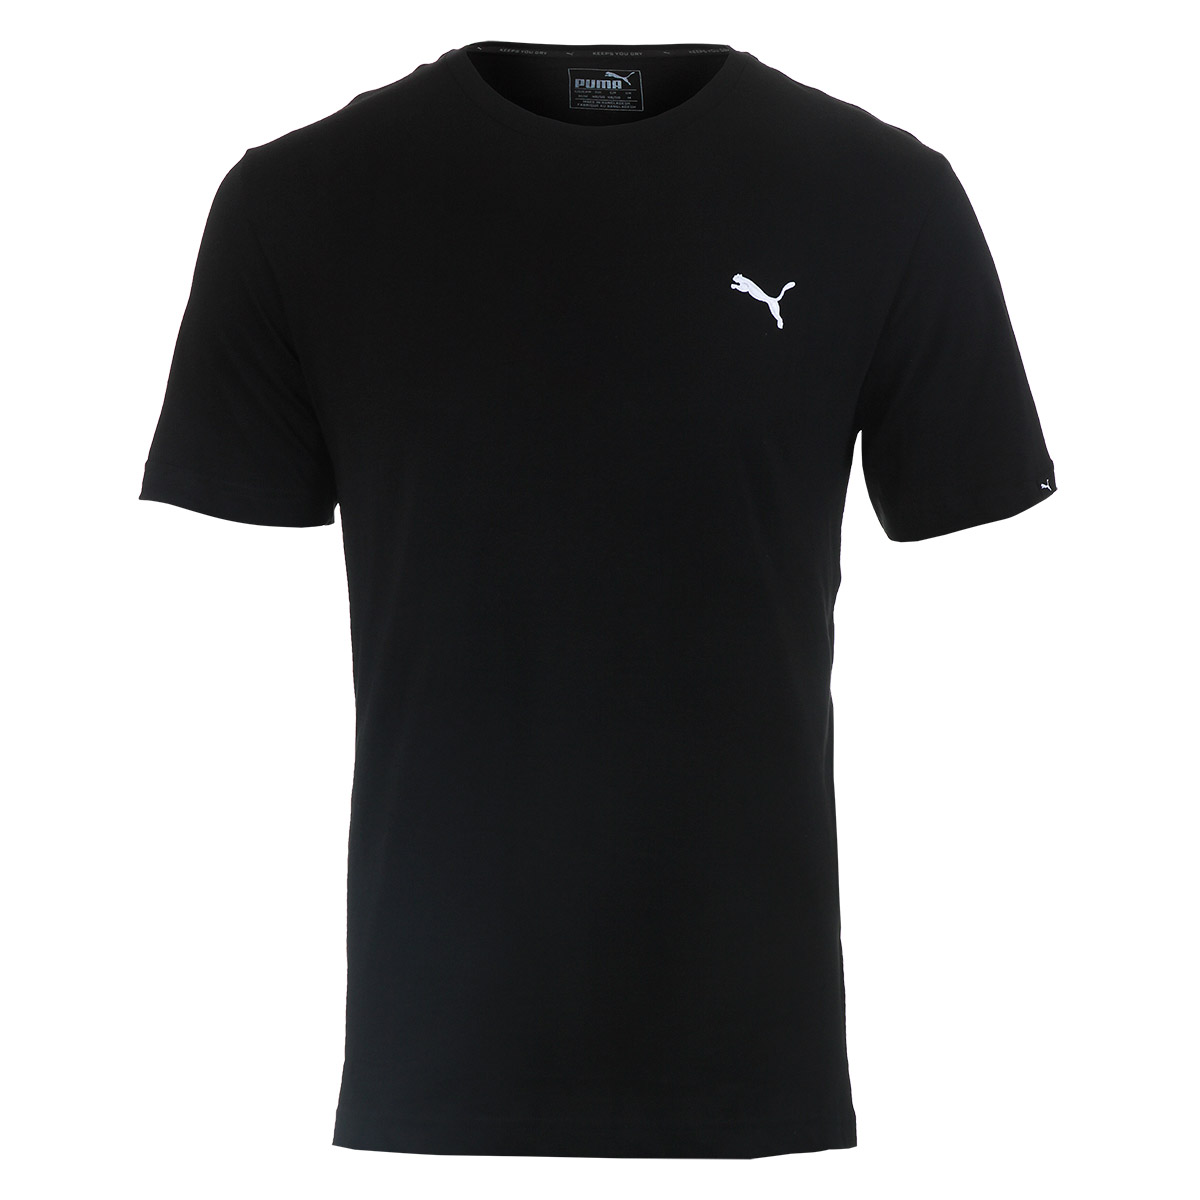 Camiseta Masc. Puma Ess Tee - Preto